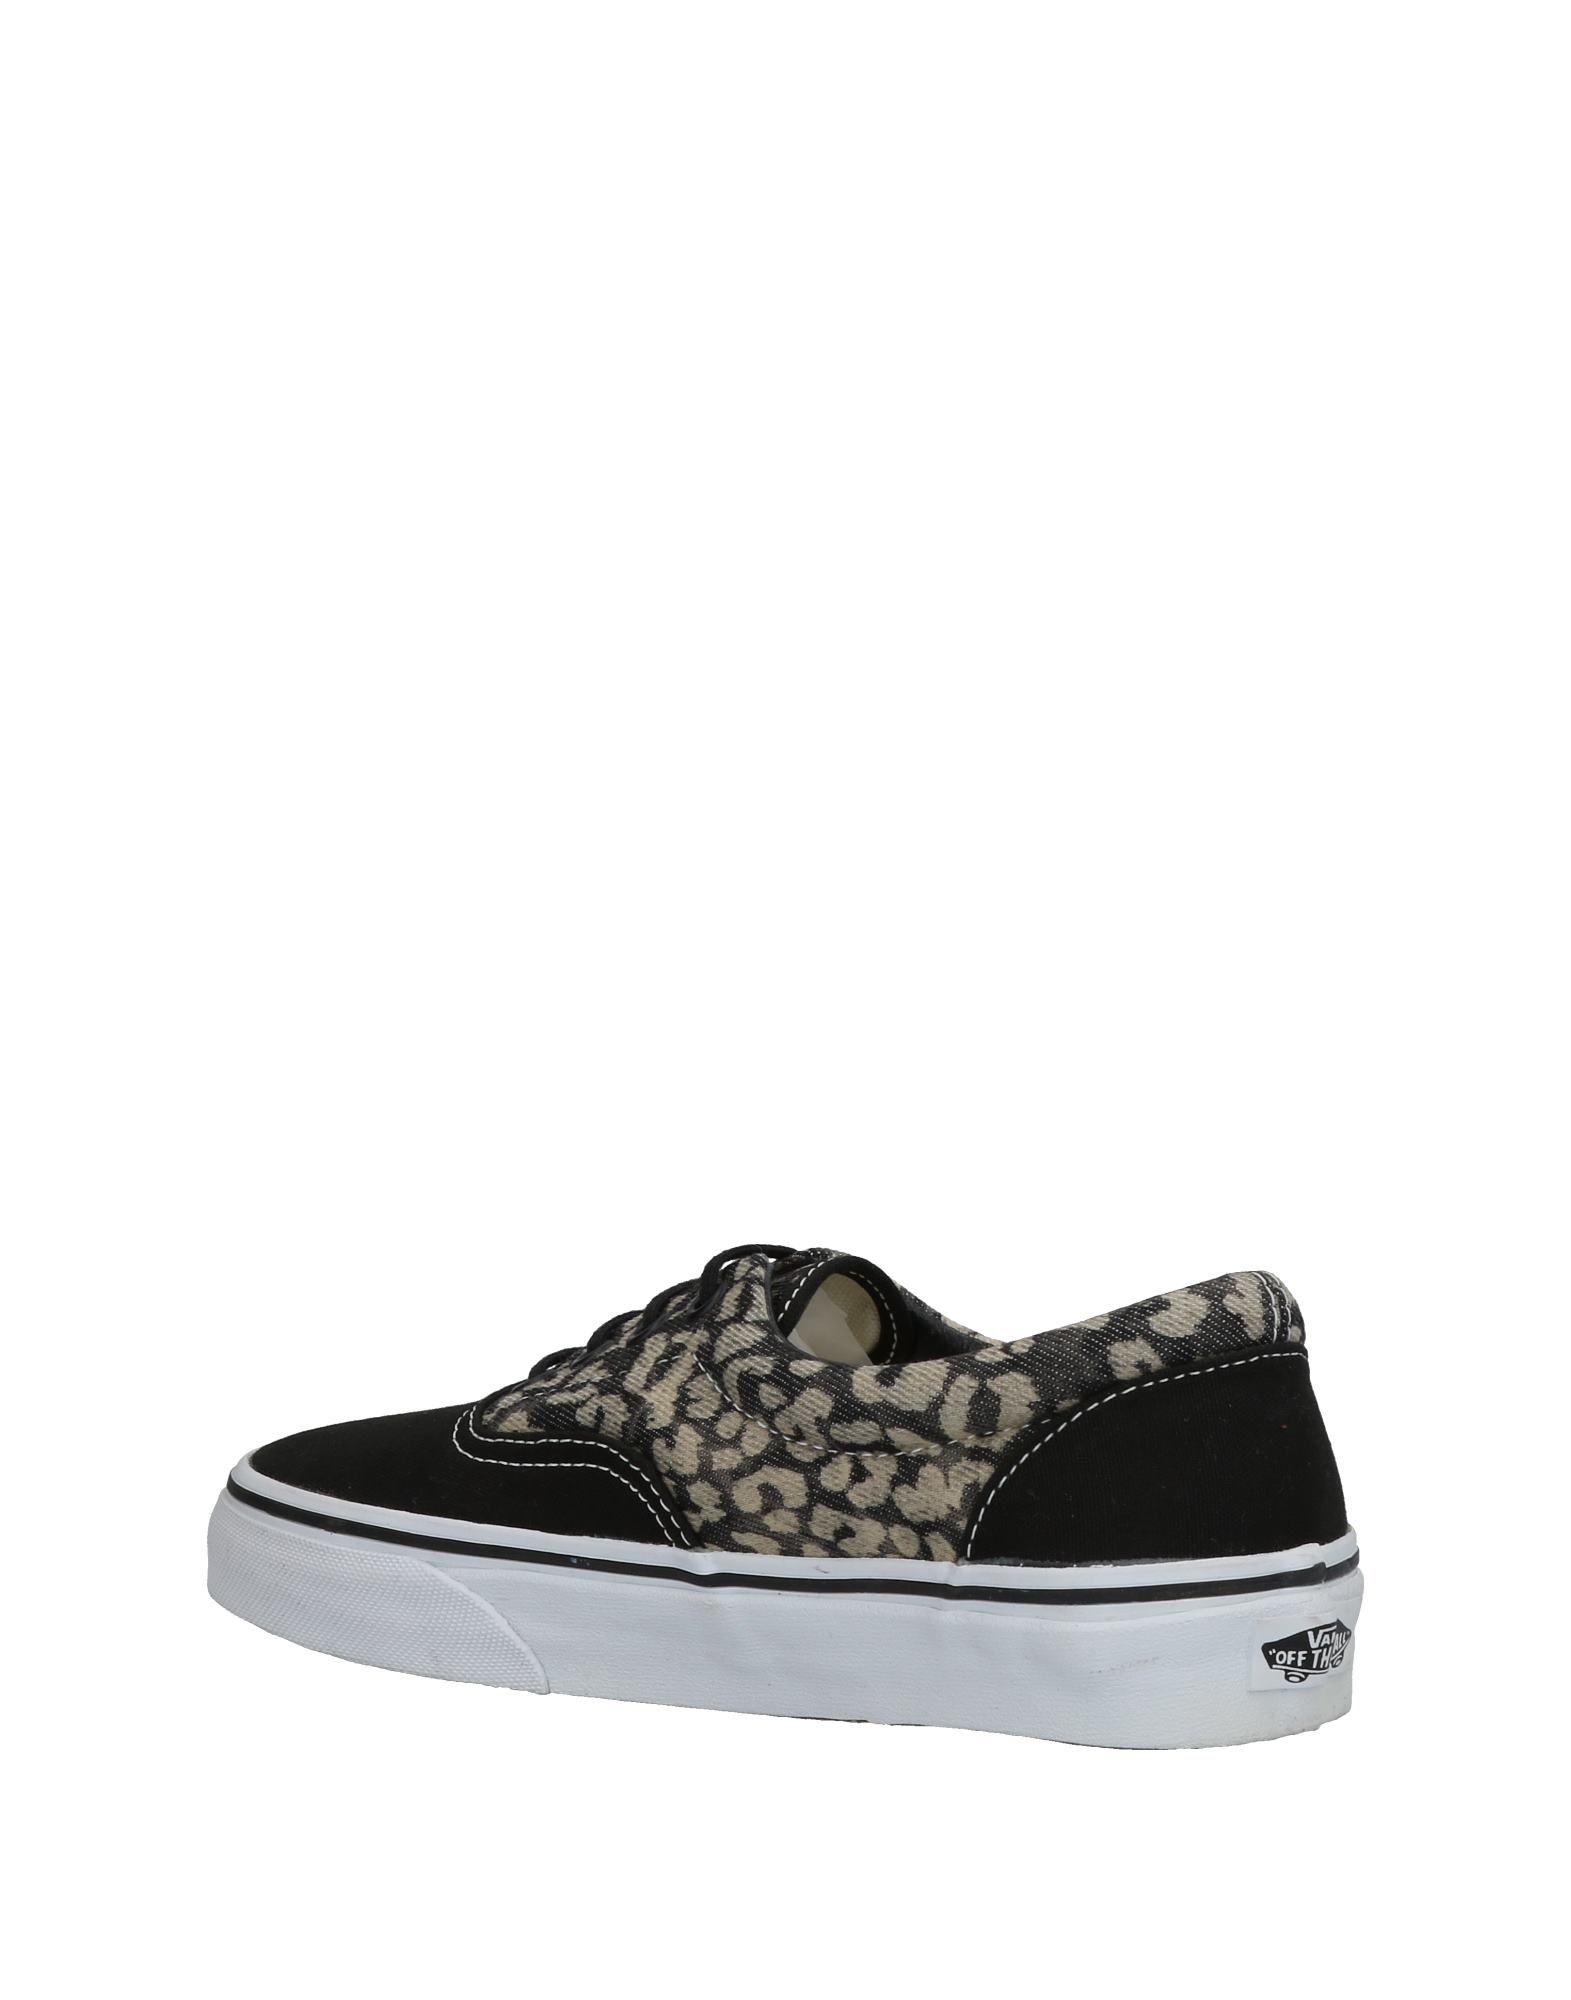 Vans Sneakers Damen  11439960BA   11439960BA d5ffa6